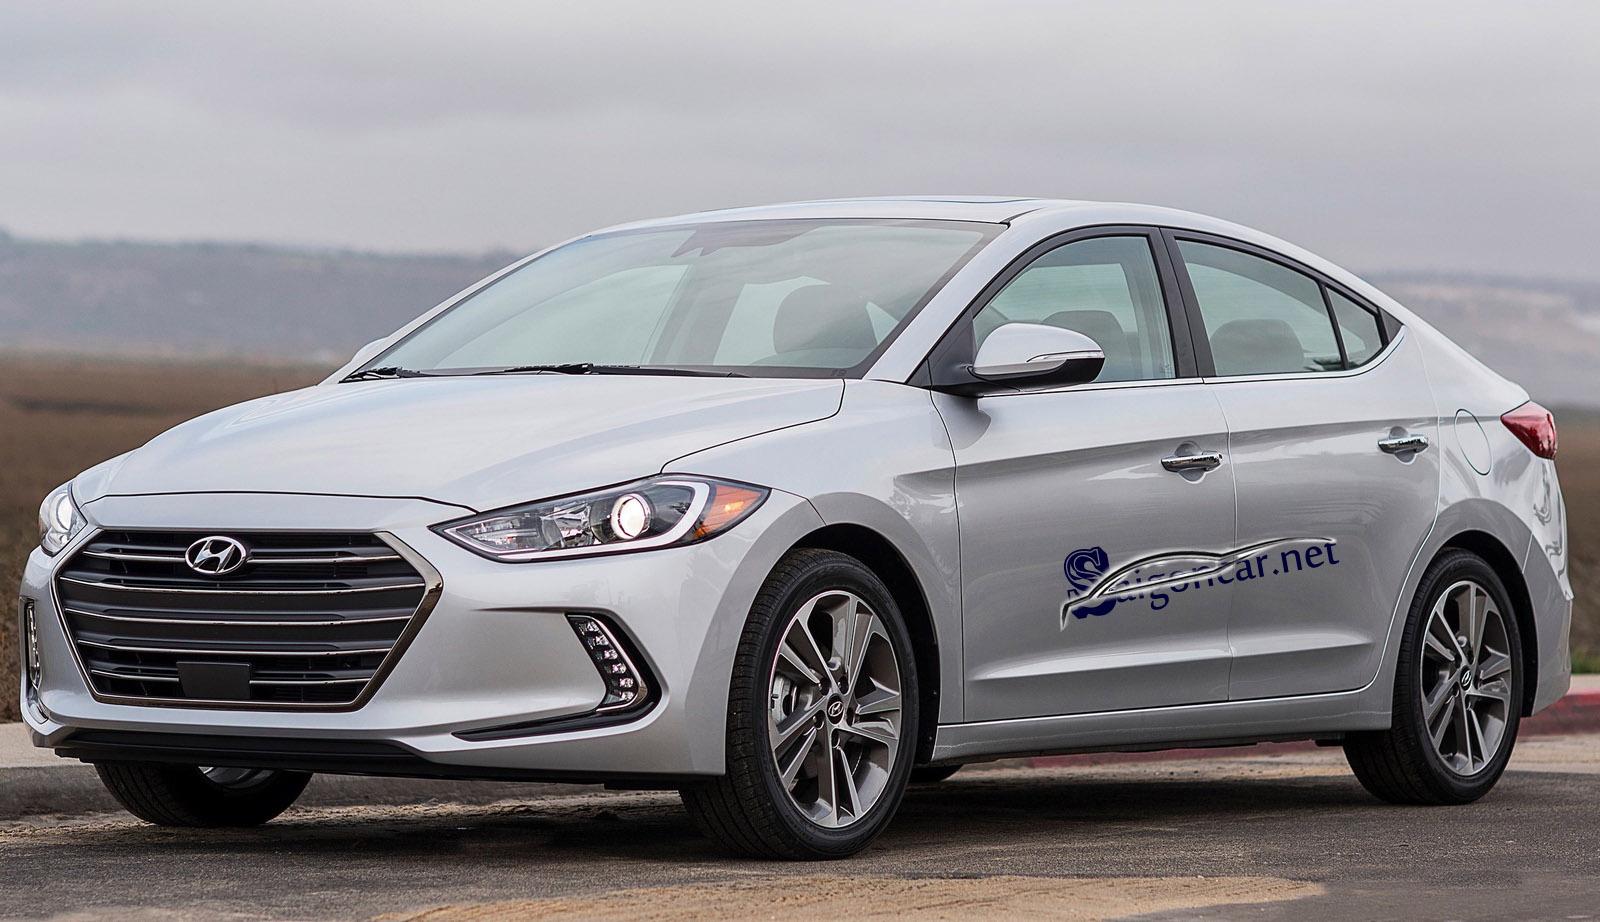 Ngoại thất Hyundai Elantra 2019